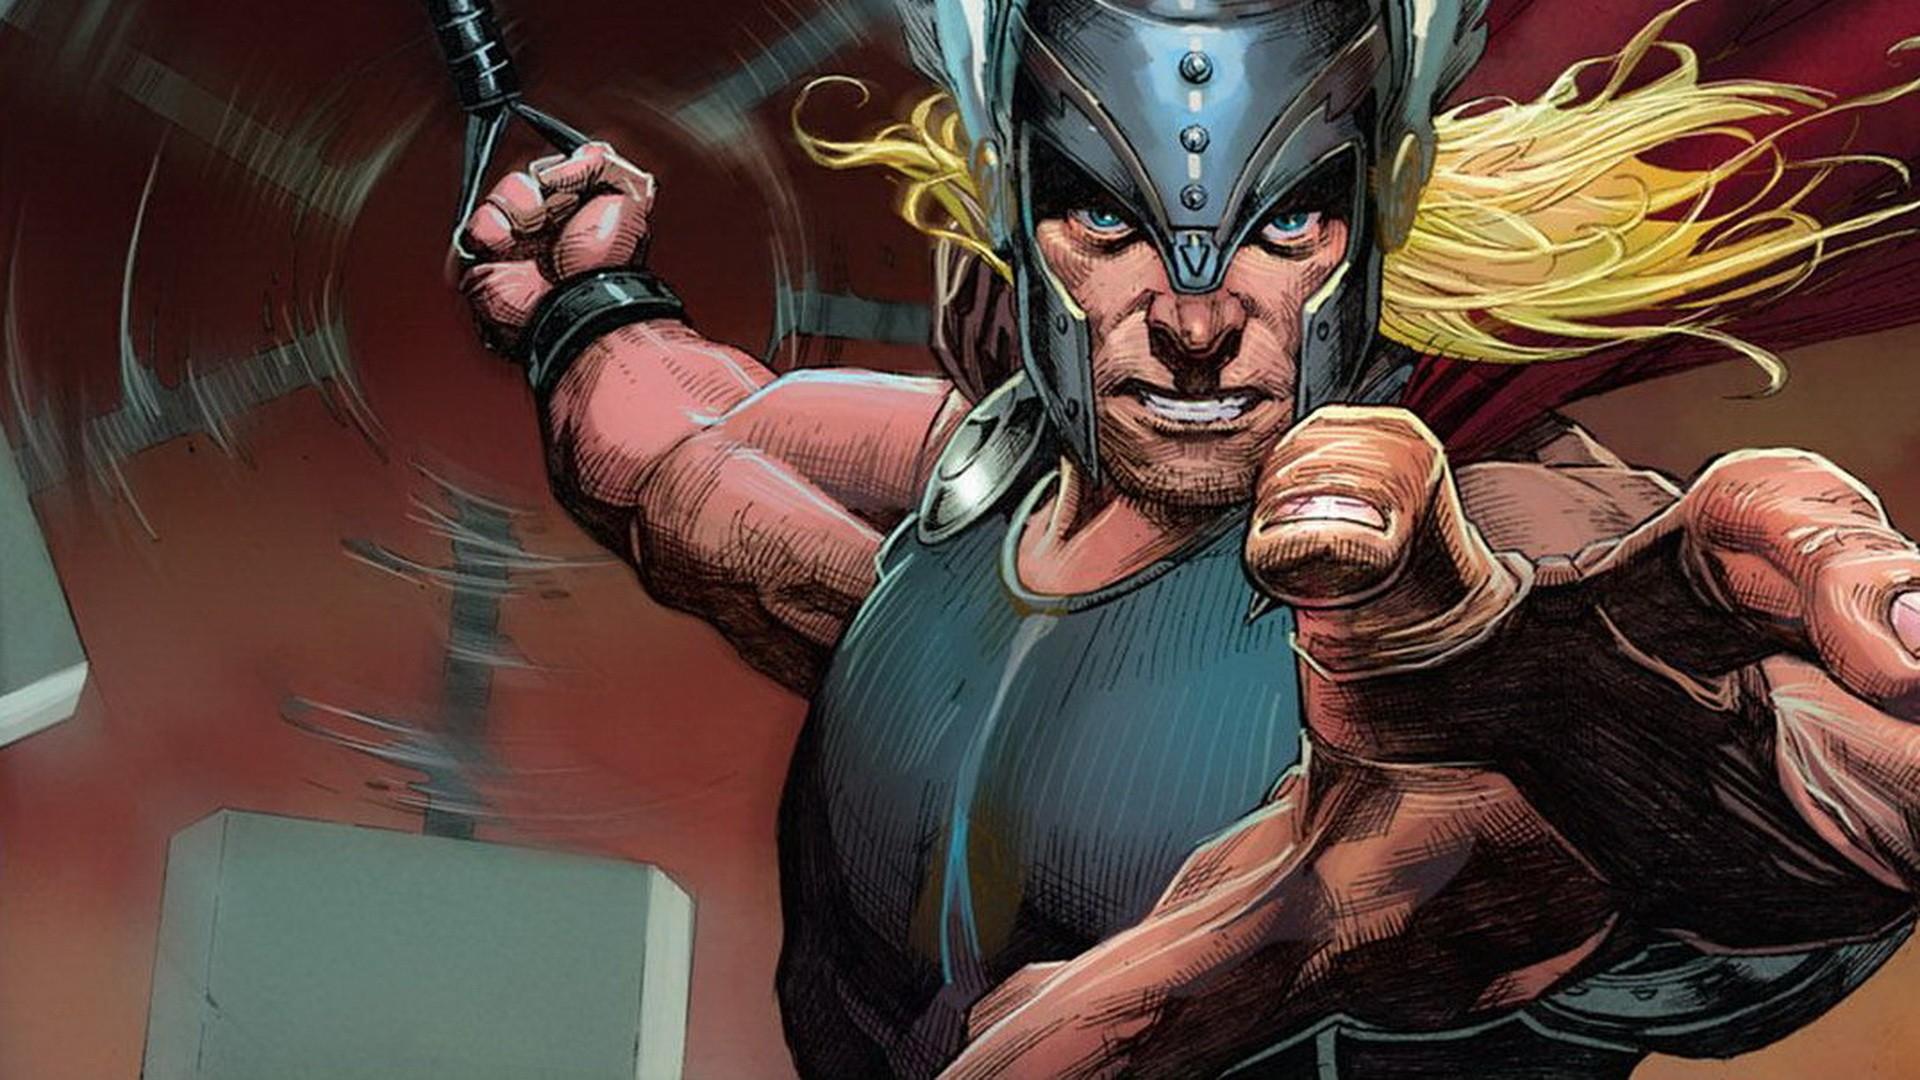 Free Thor Wallpaper HD for Desktop (12)